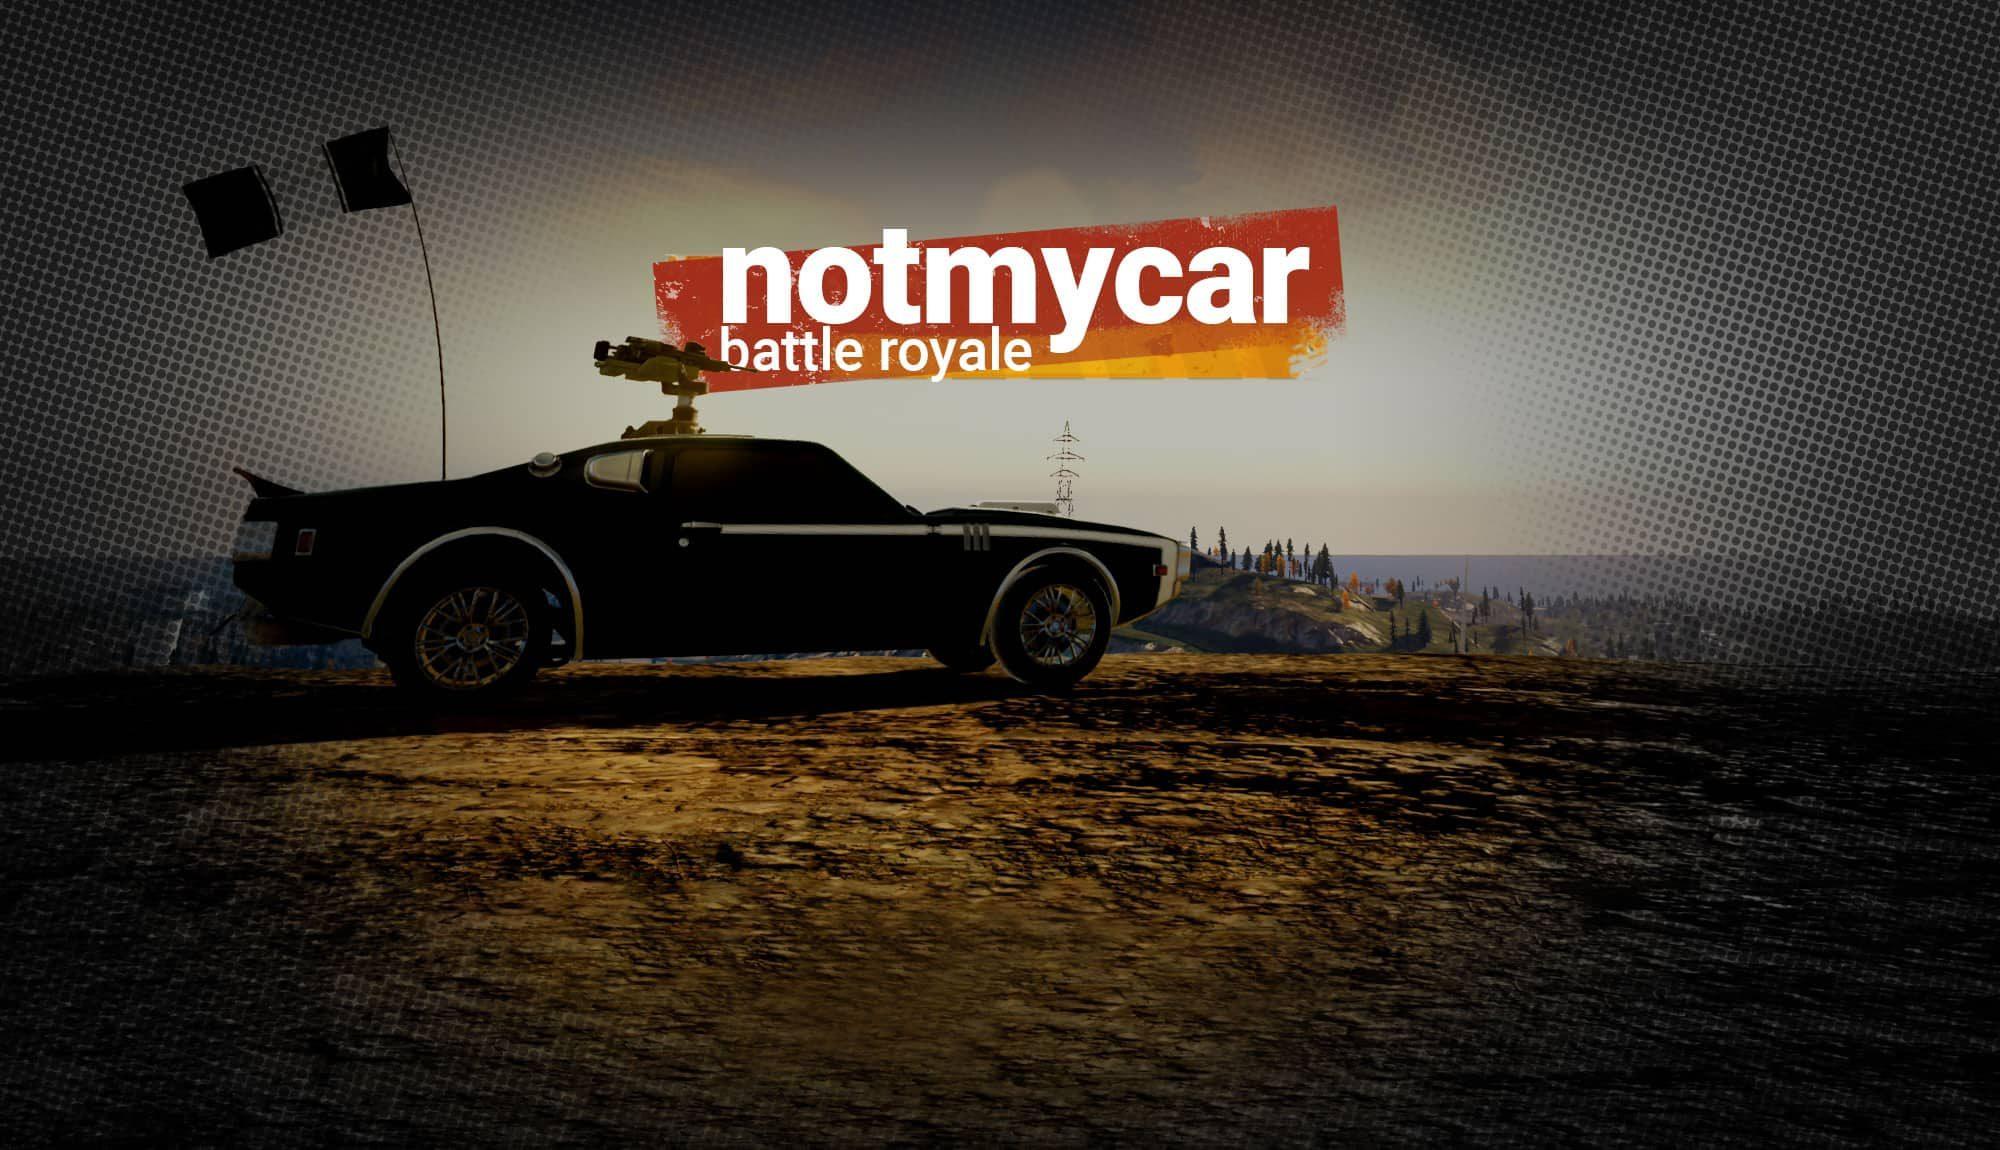 notmycar-battle-royale-ya-esta-disponible-y-es-gratis-en-steam-frikigamers.com